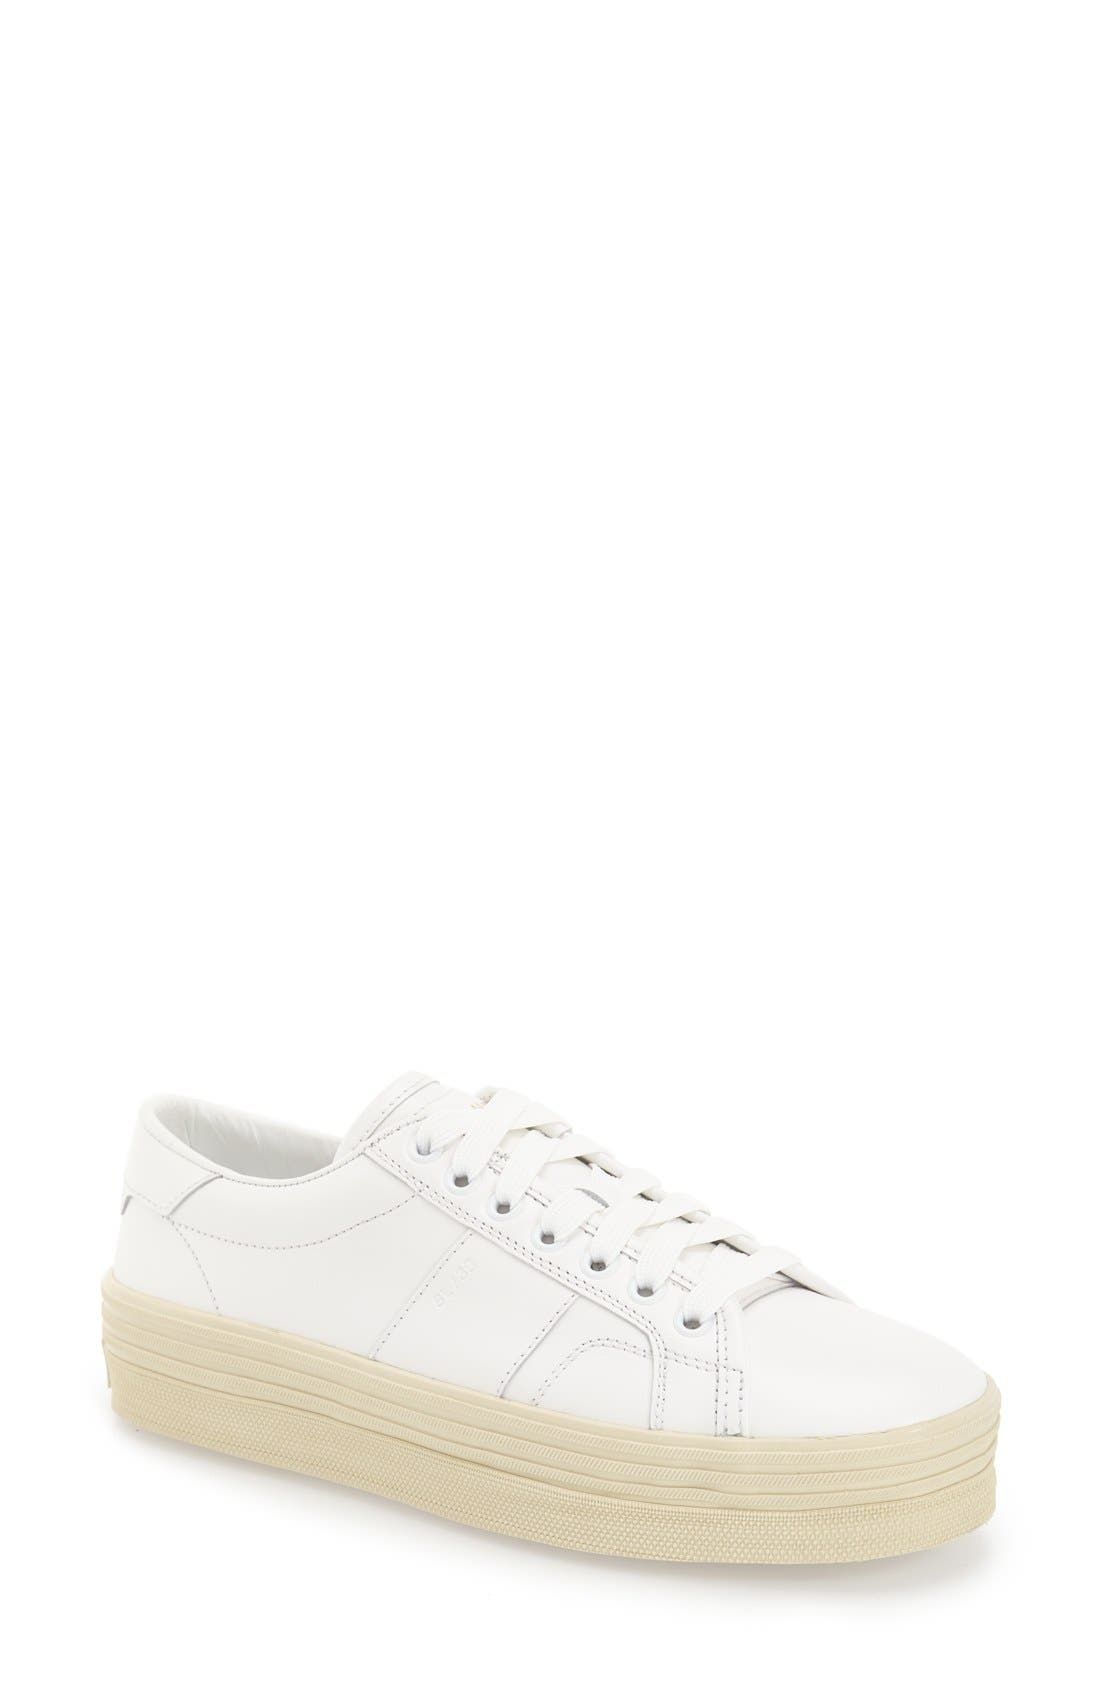 Double Sole Sneaker,                             Main thumbnail 1, color,                             100